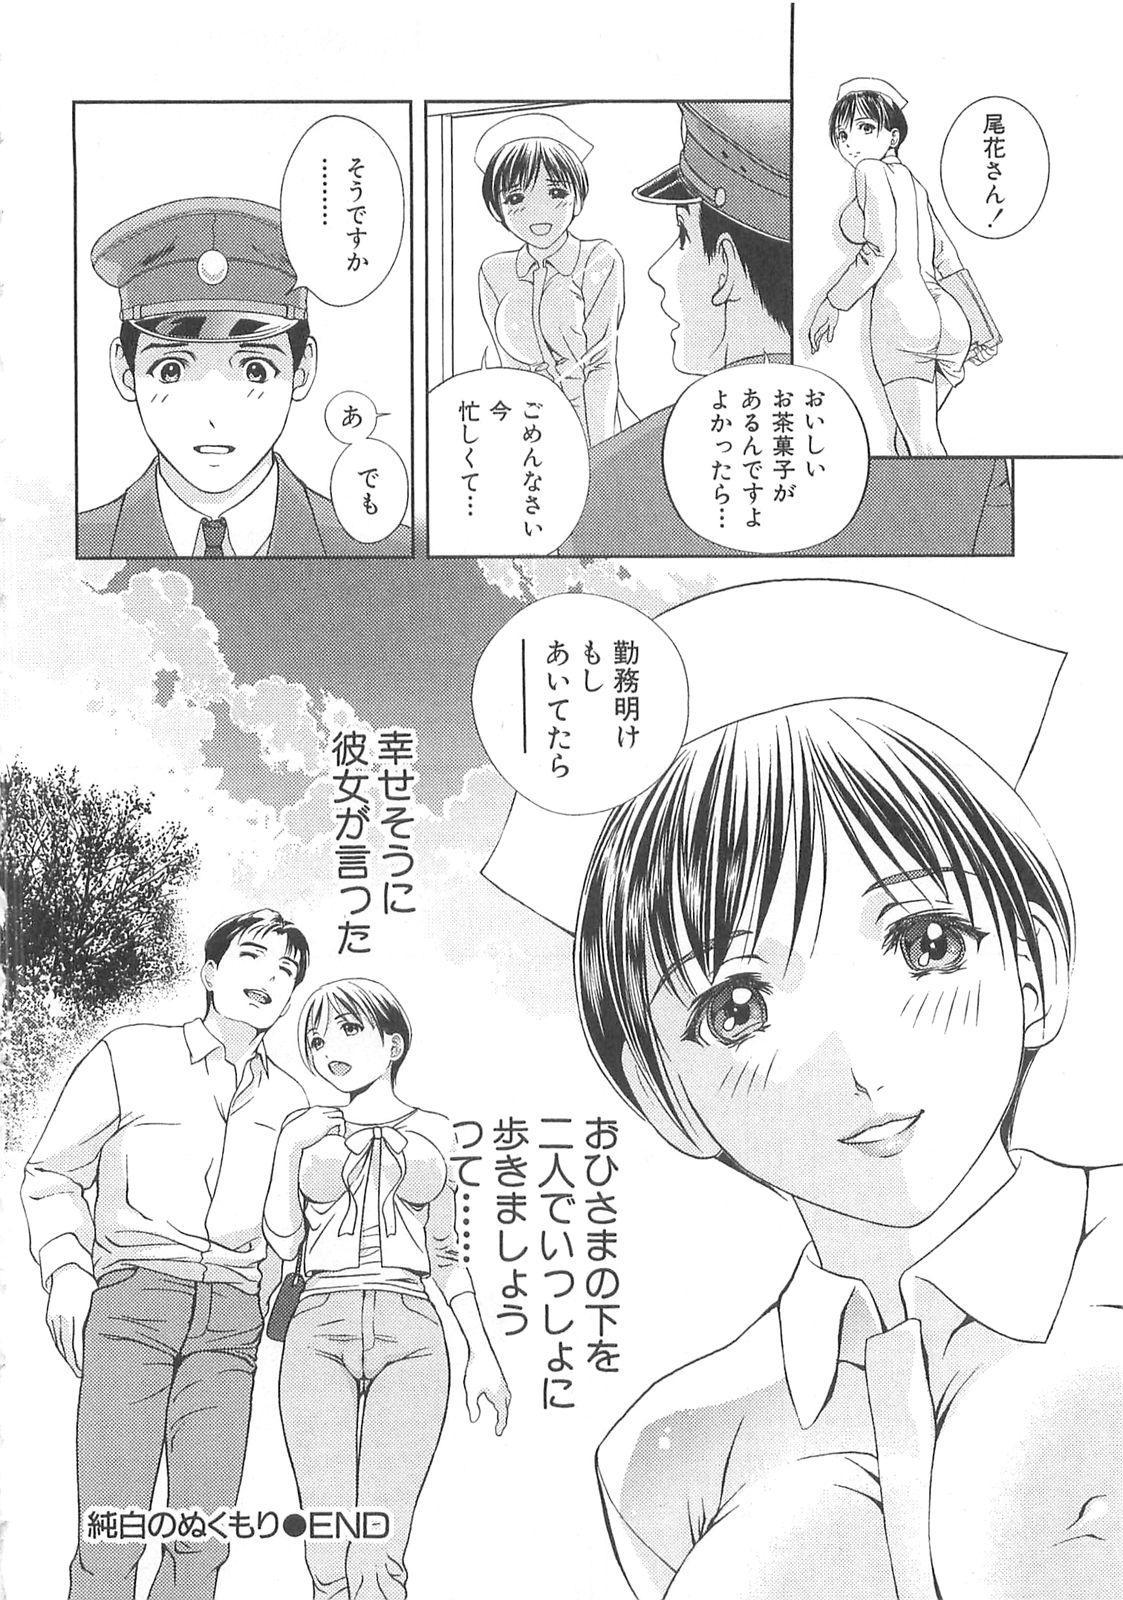 Tenshi no Kyuu - Angel's Pretty Hip 104